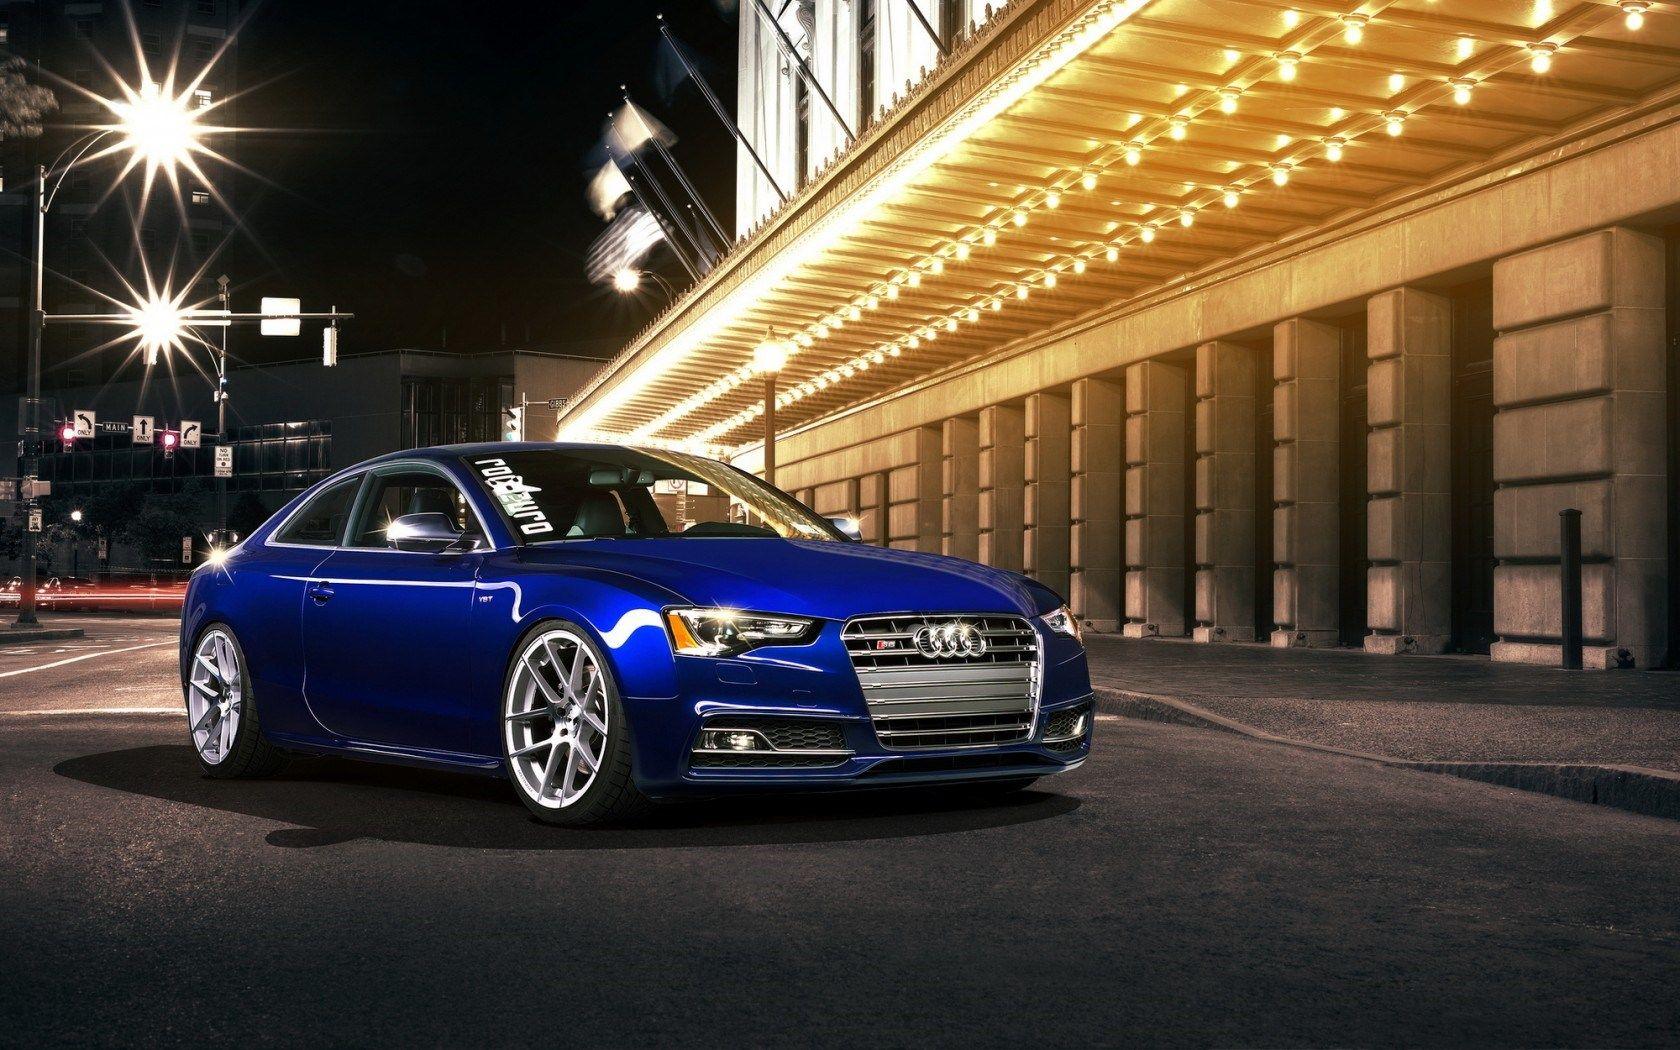 Audi S5 Coupe Tuning Street Night Hd Wallpaper Freehdwalls Audi S5 Audi Latest Cars